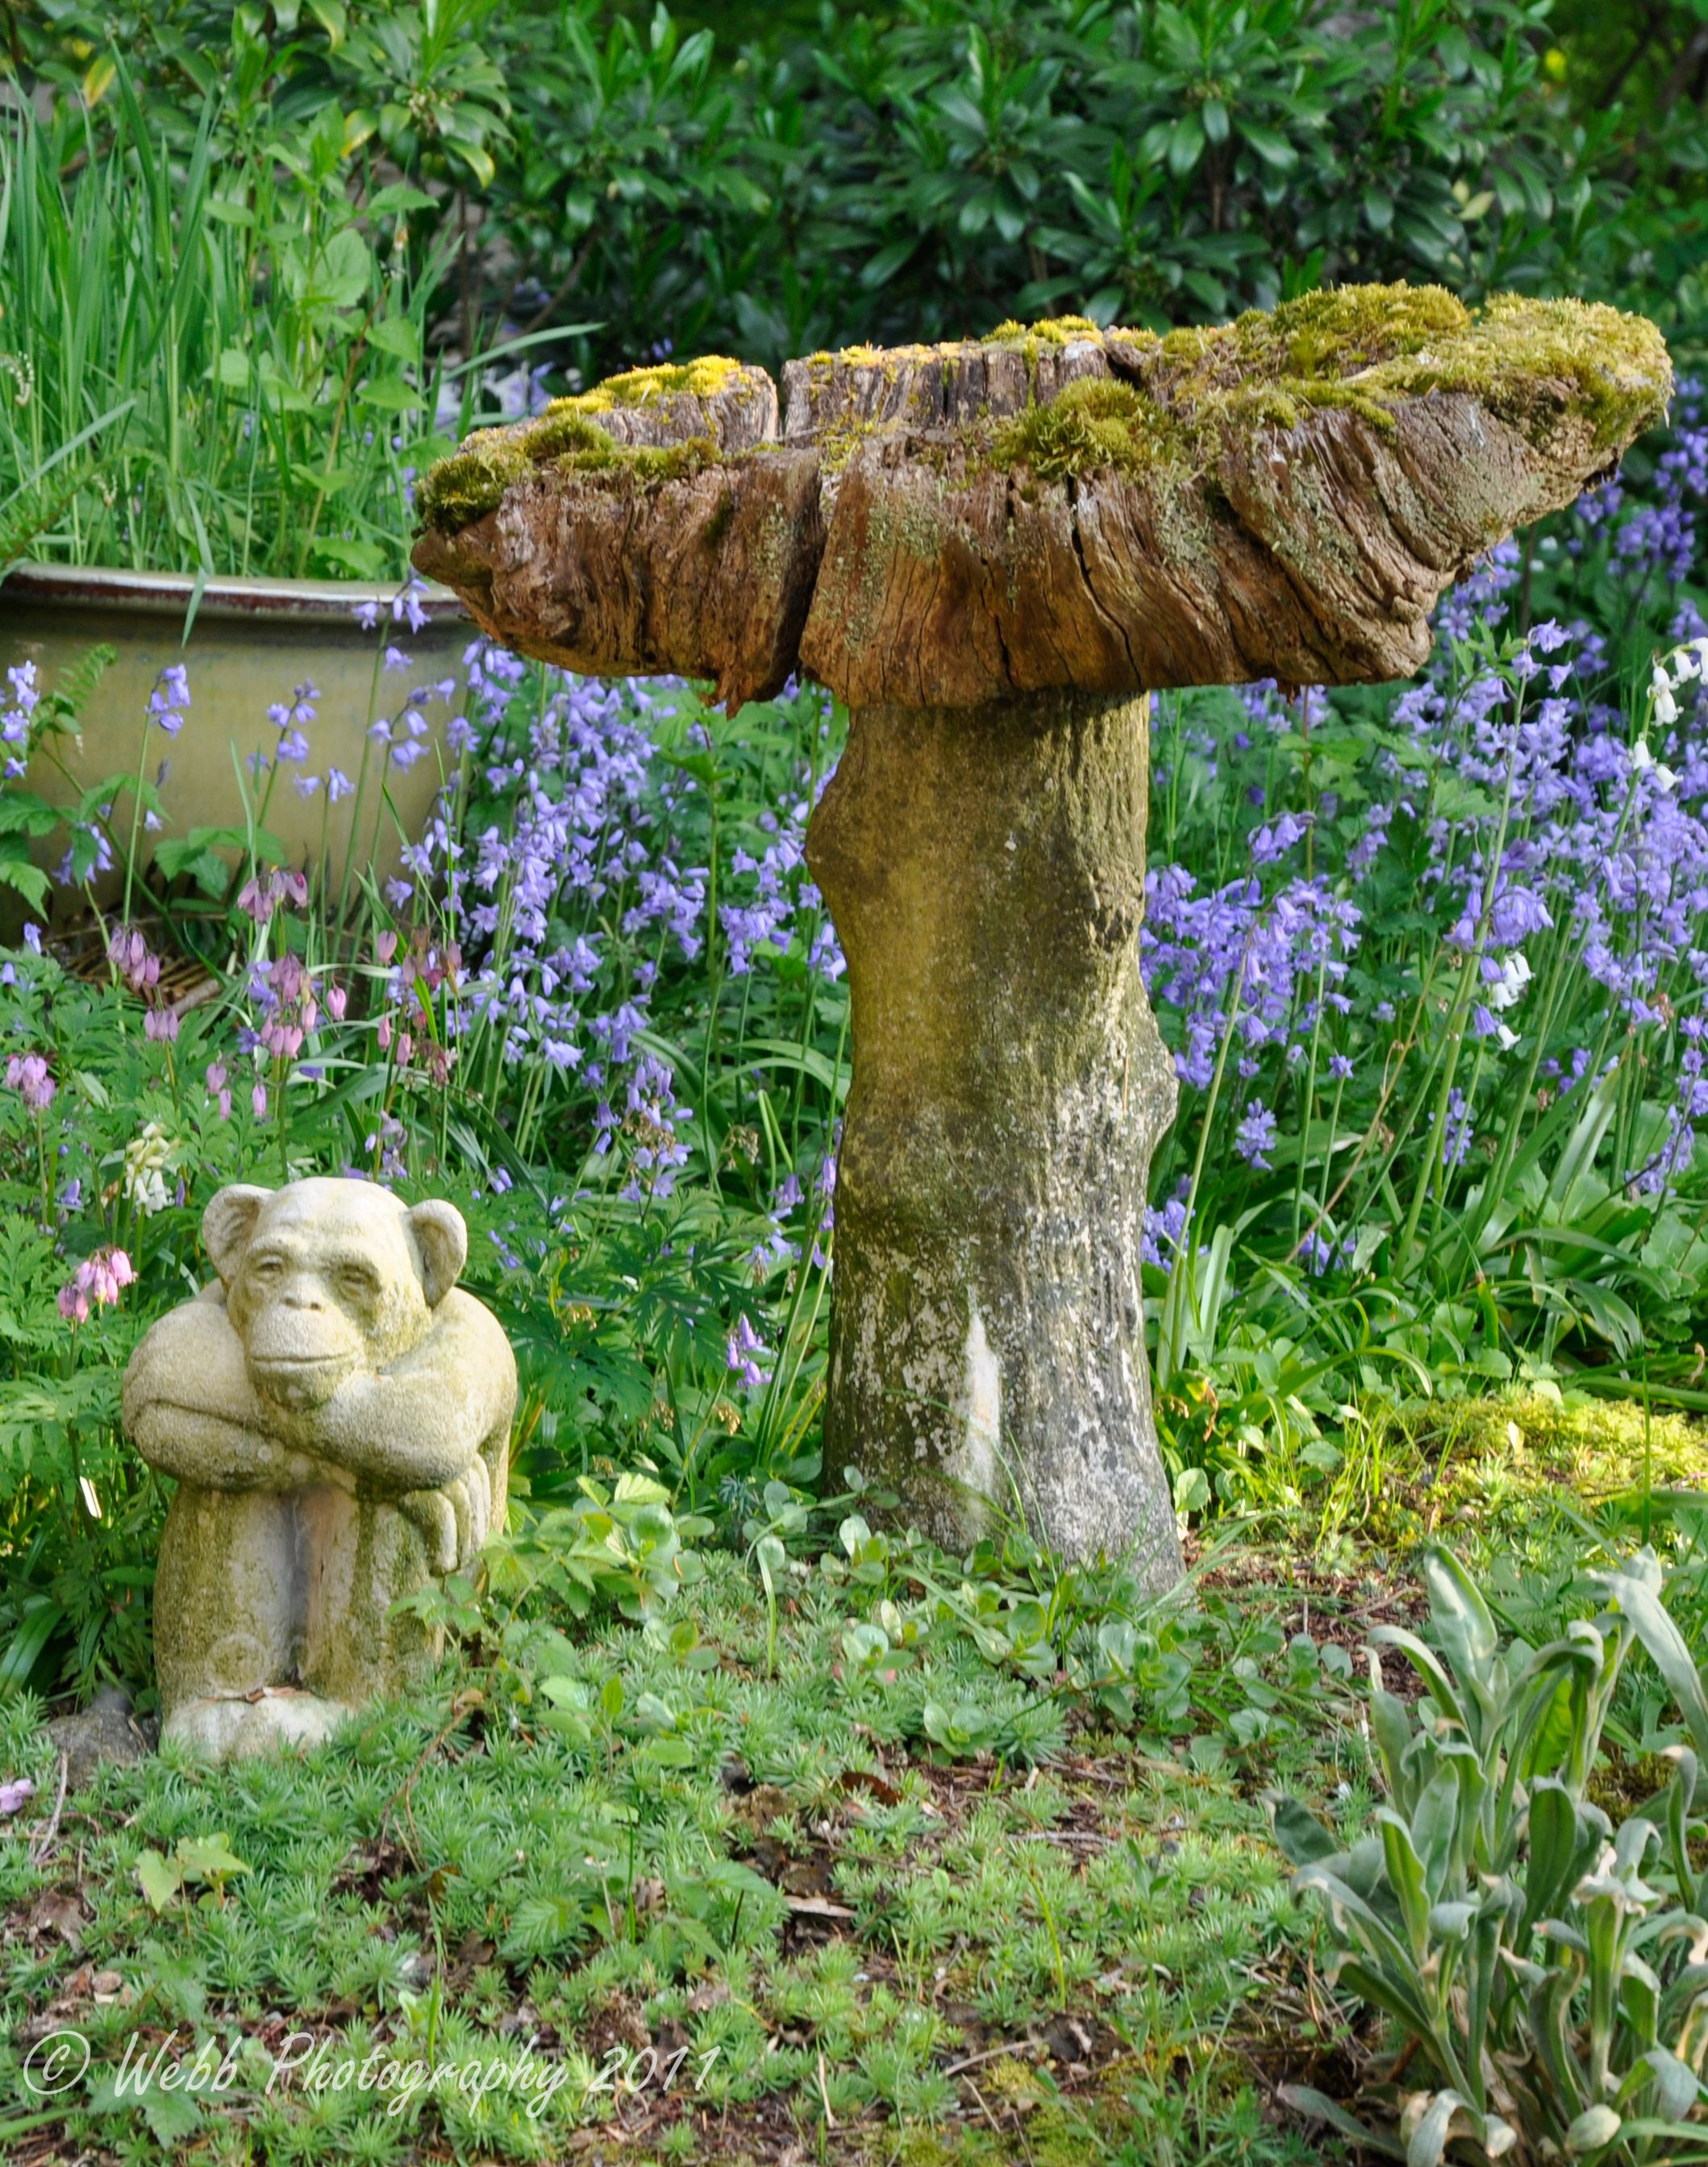 Monkey Statue And An Old Wooden Bird Bath Monkey Statue